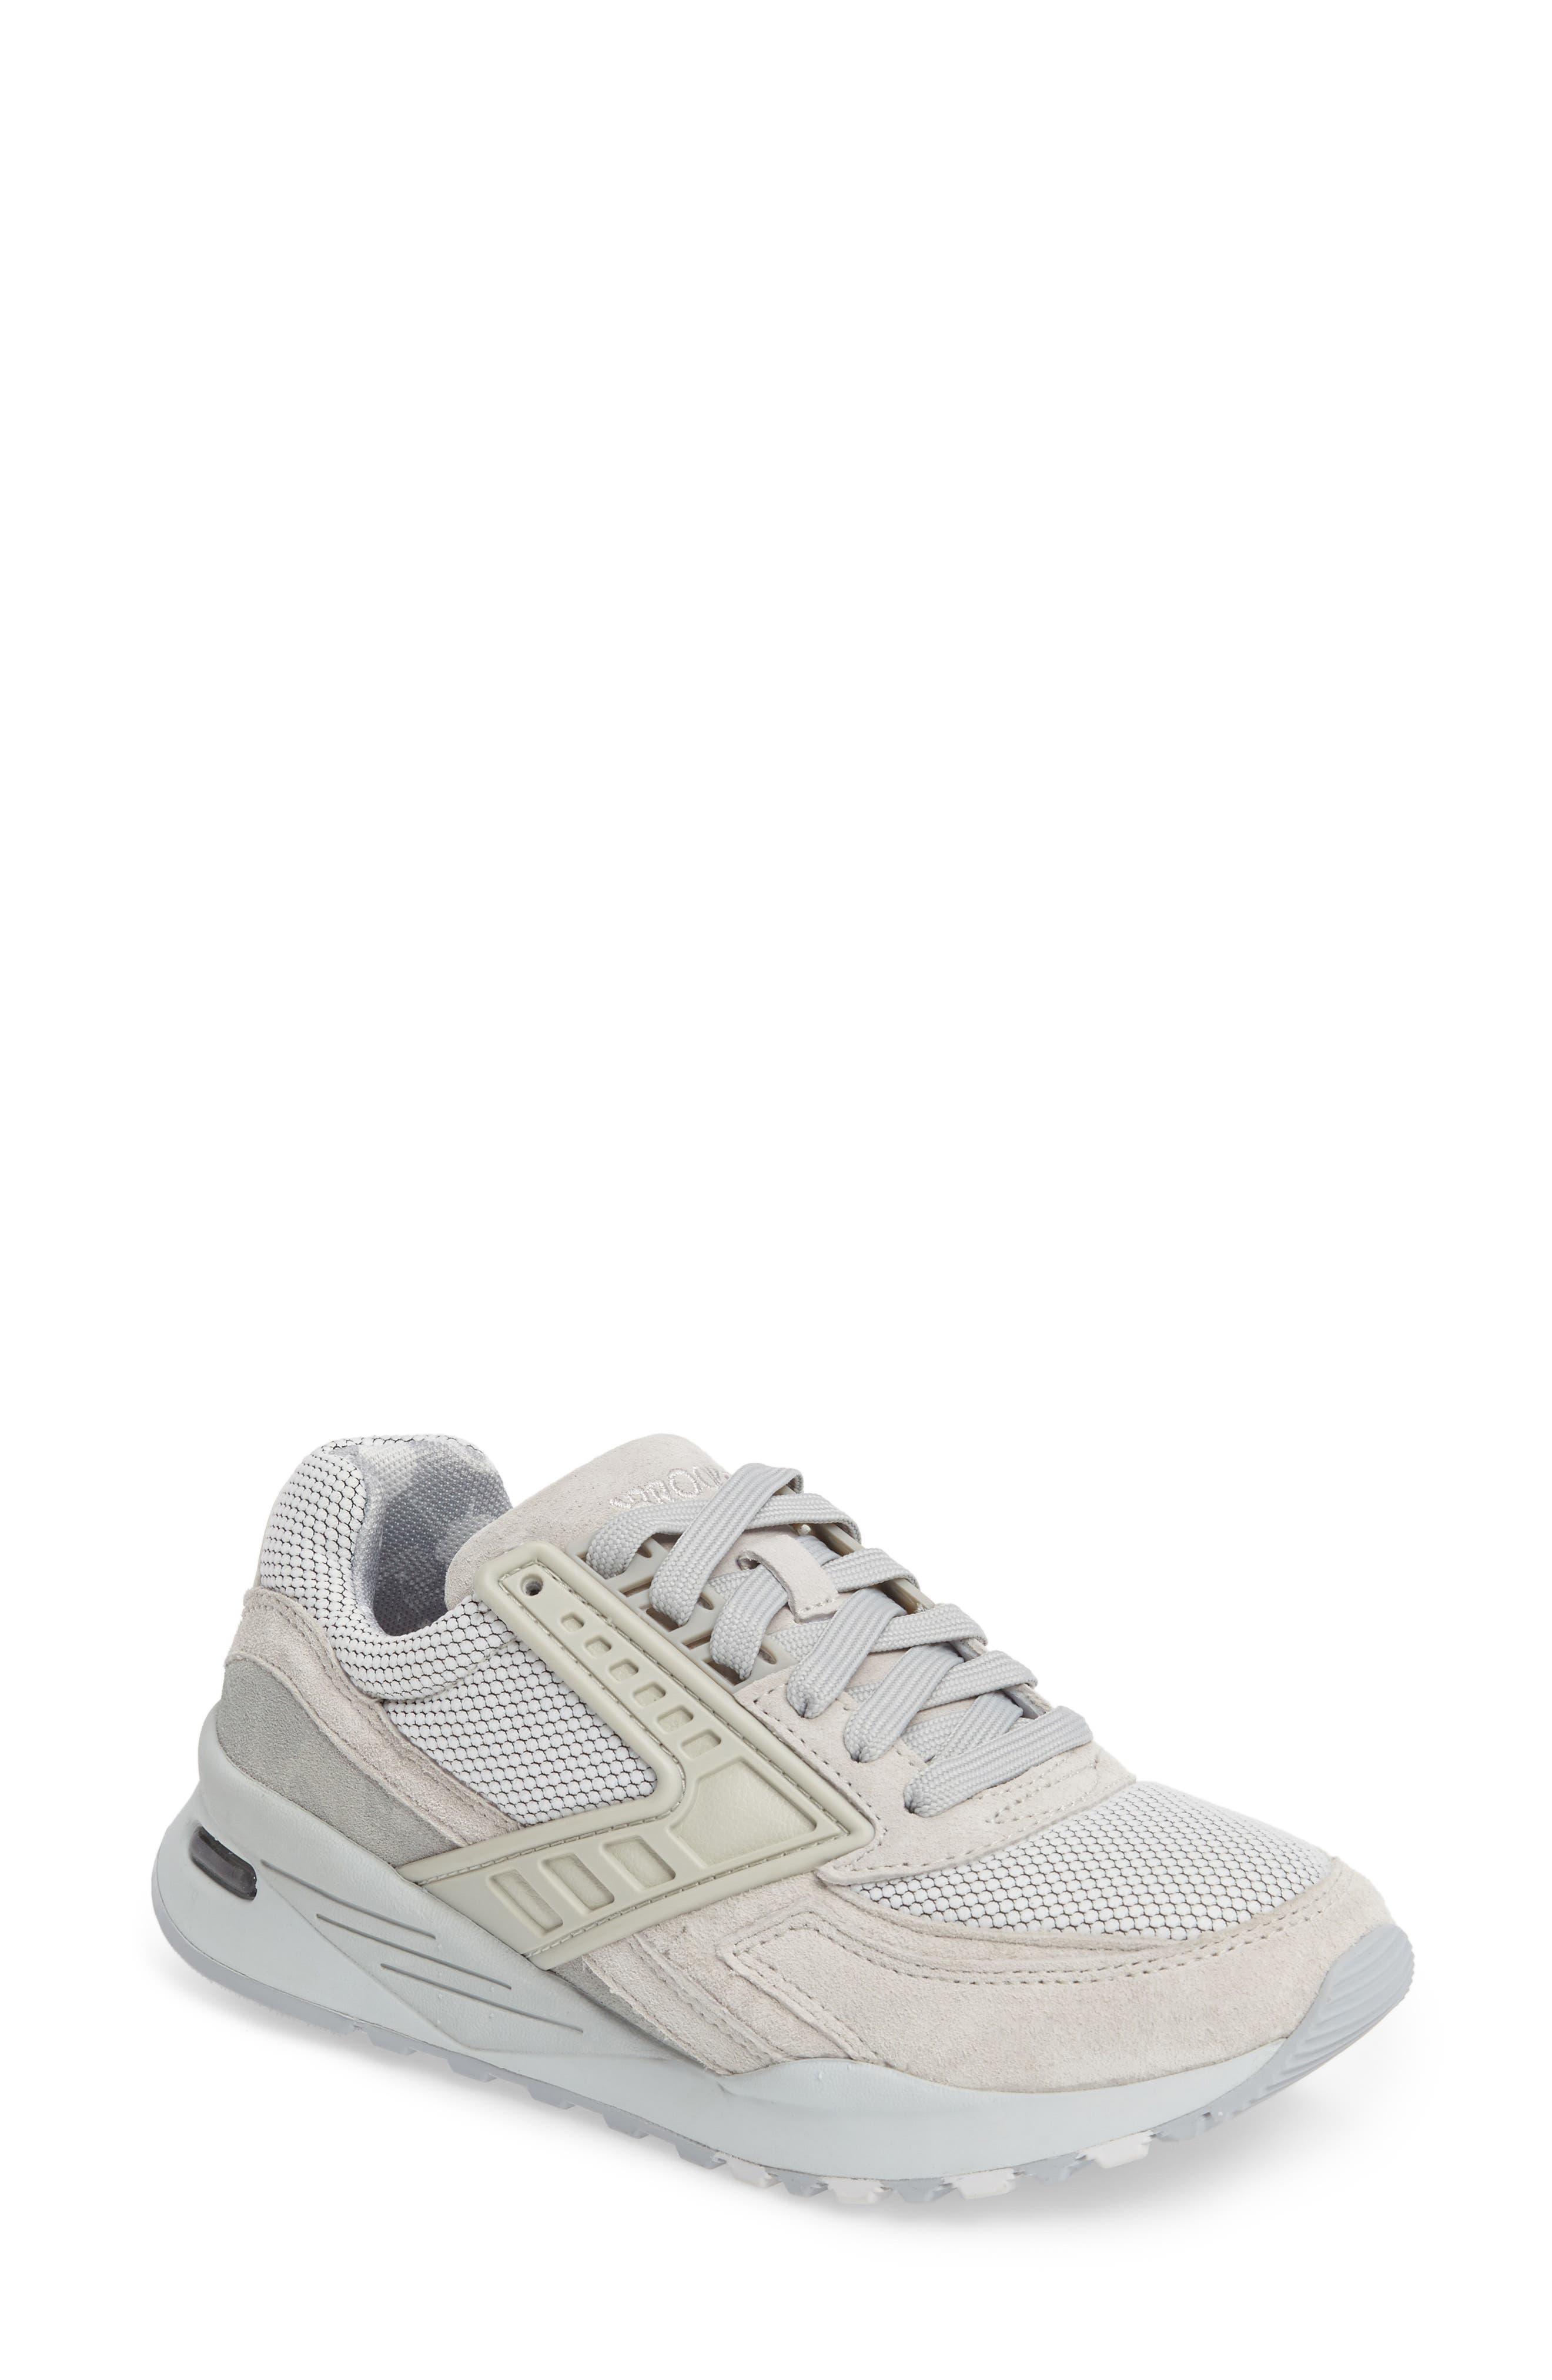 'Evenfall Regent' Sneaker,                             Main thumbnail 4, color,